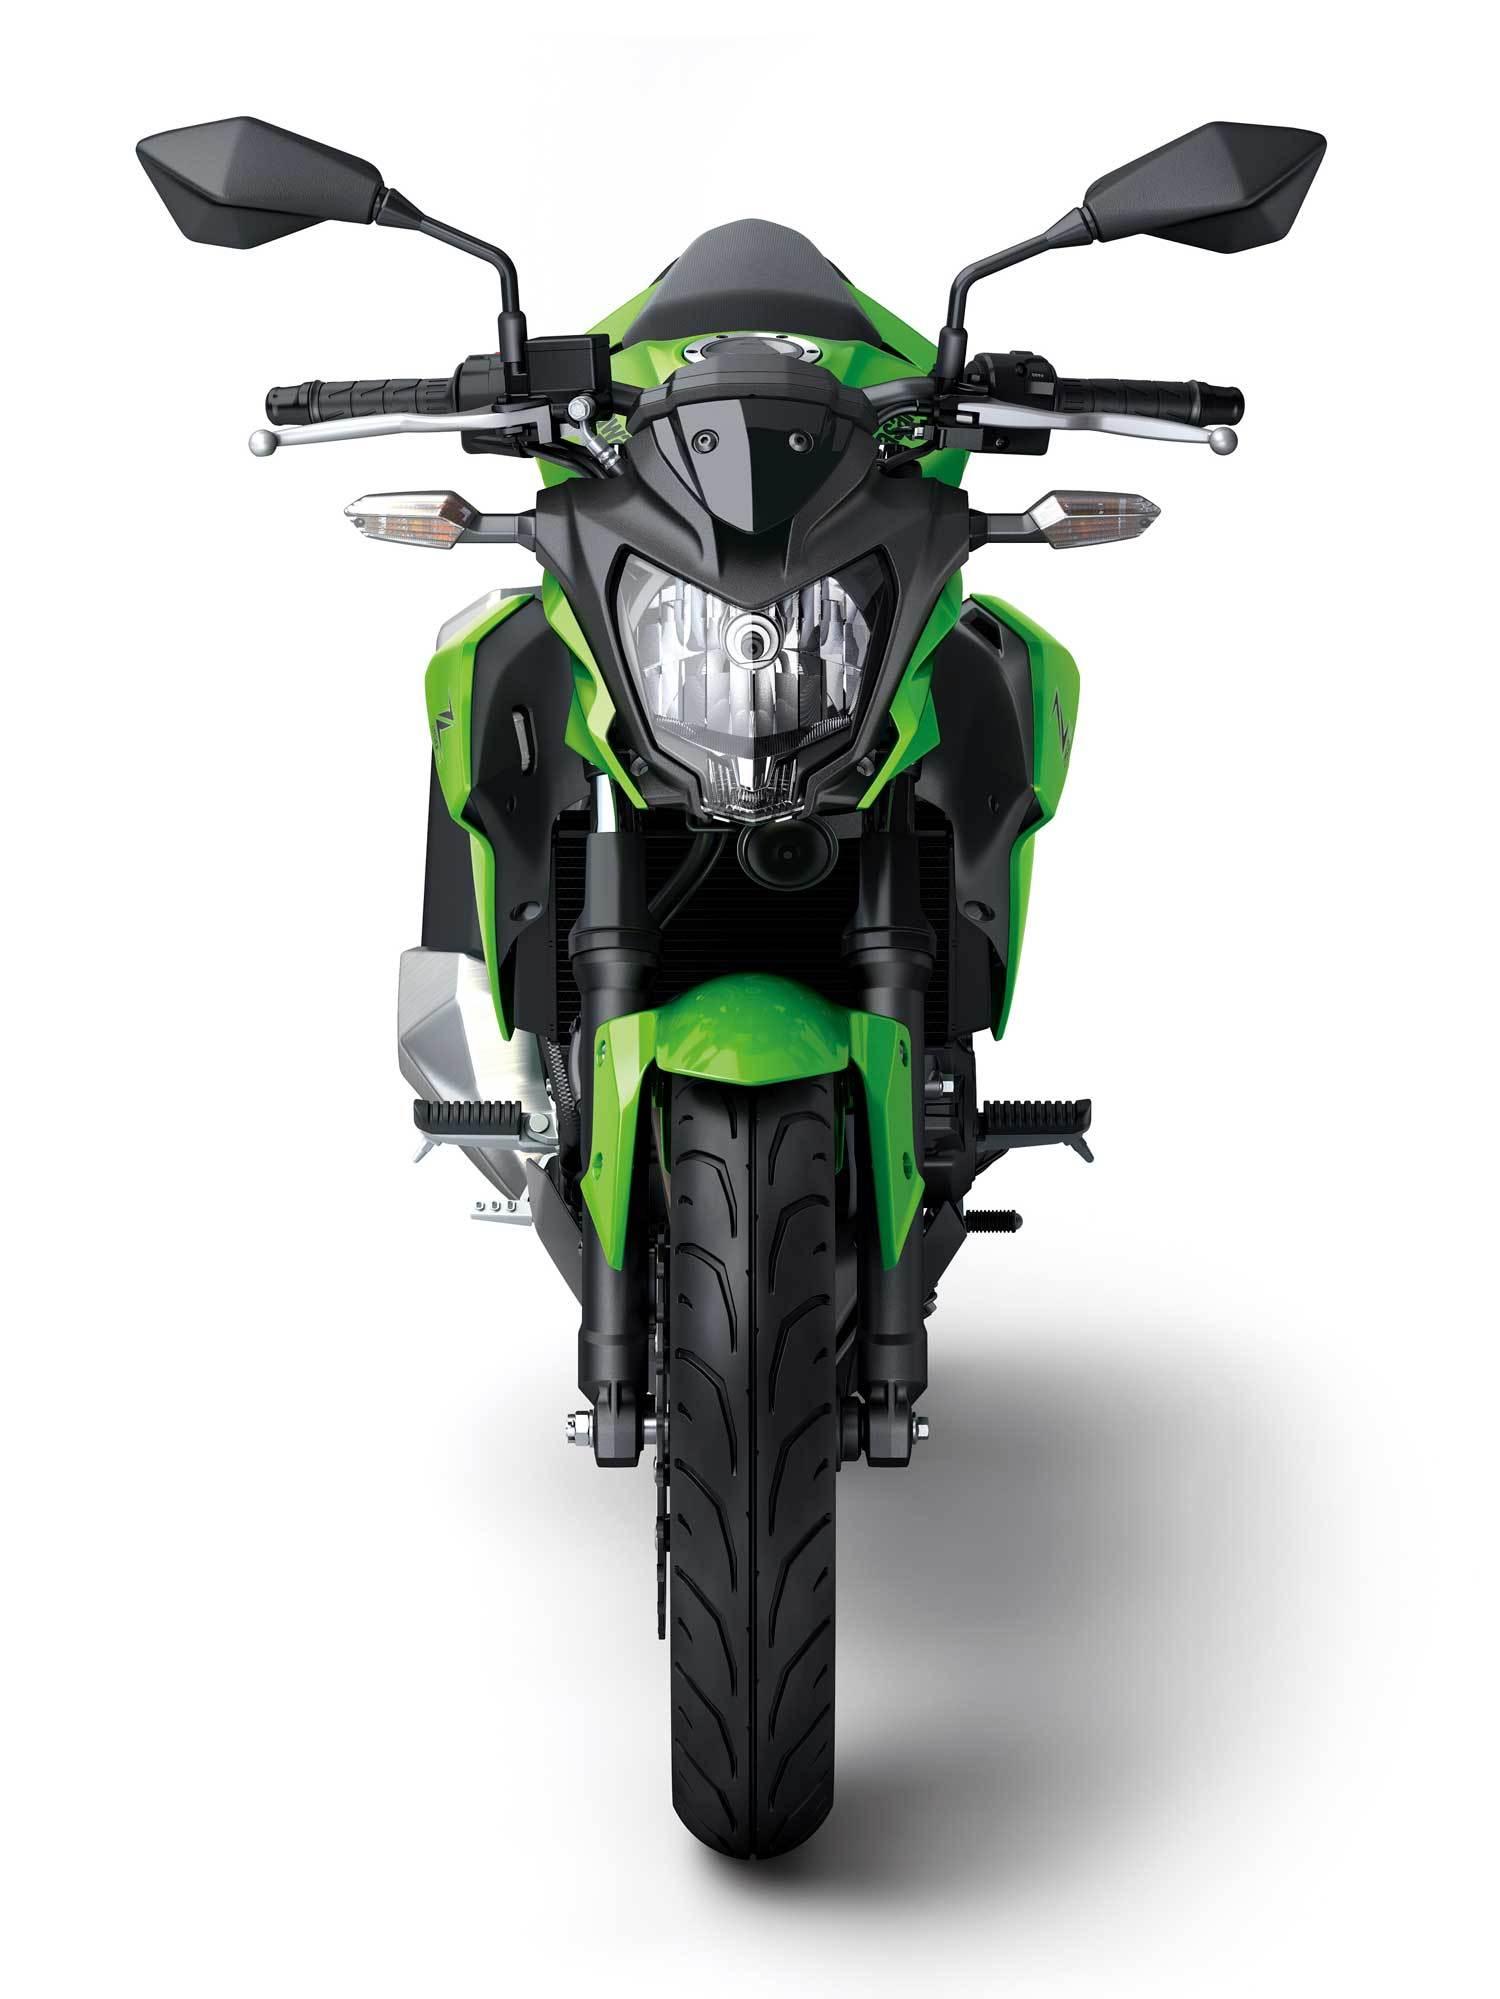 Ninja 250sl price in bangalore dating